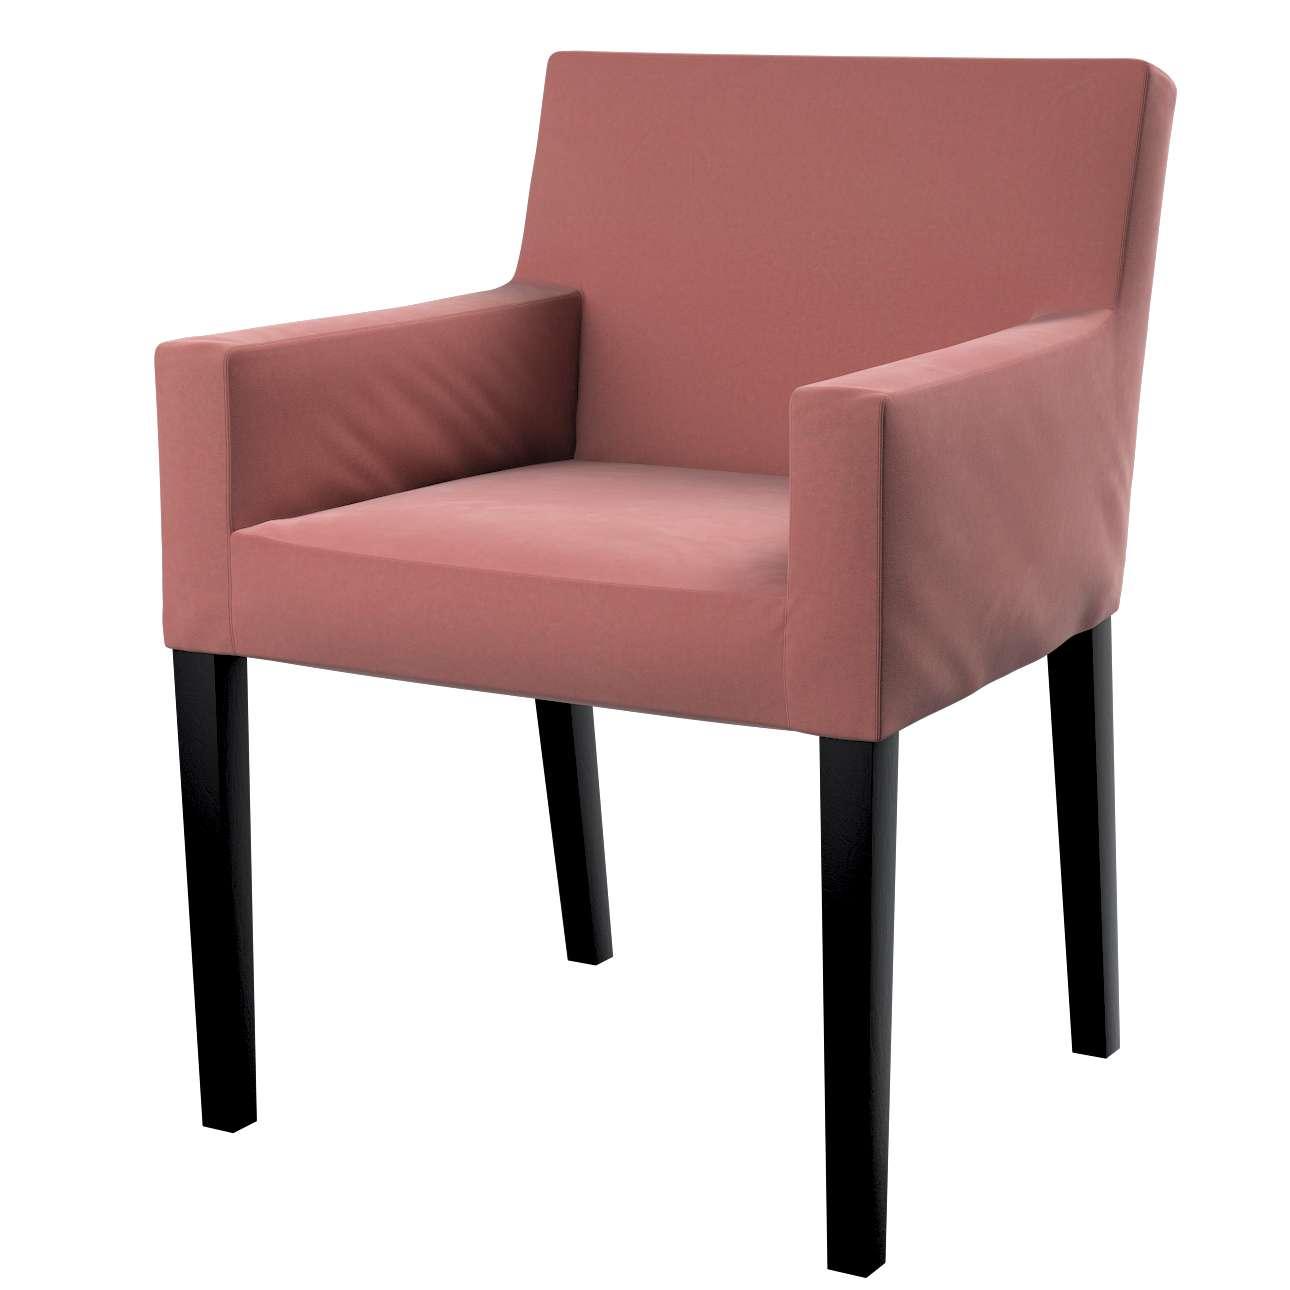 Návlek na stoličku s opierkami Nils V kolekcii Velvet, tkanina: 704-30